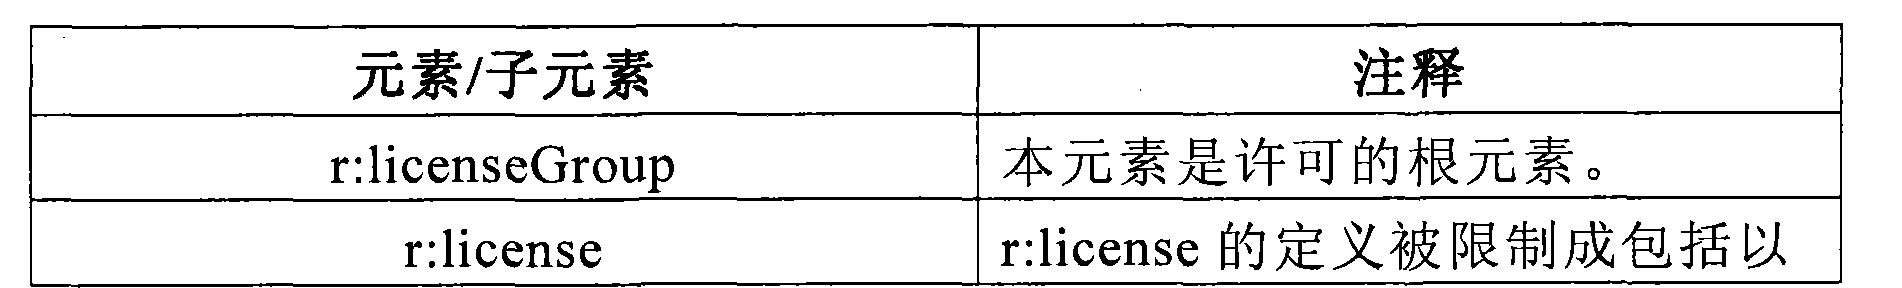 Figure CN102567676AD00462